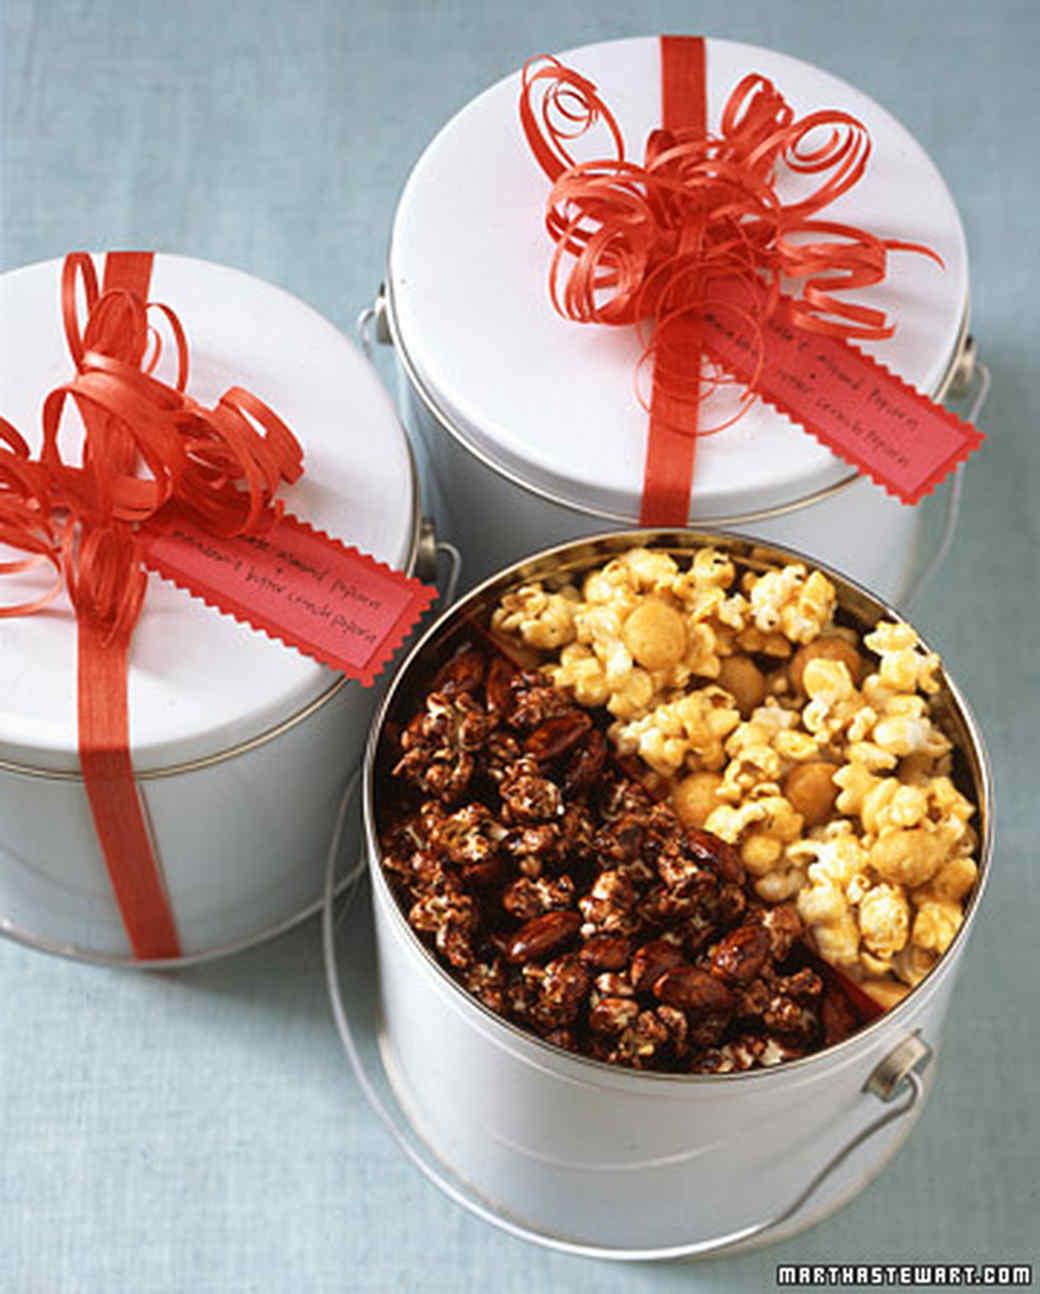 Handmade Gifts for Him | Martha Stewart